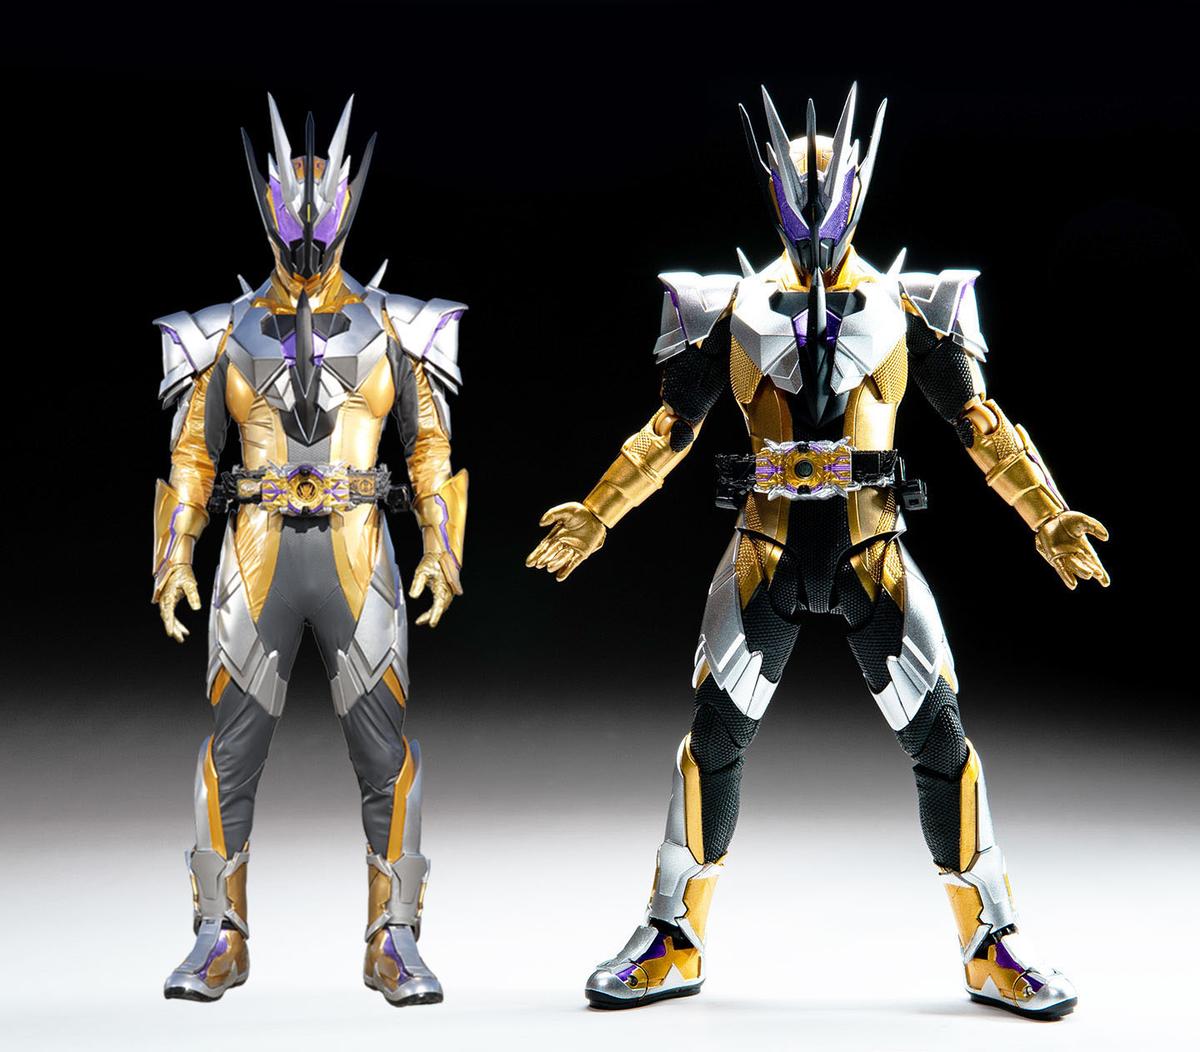 f:id:hiroban-ch:20210214134150j:plain